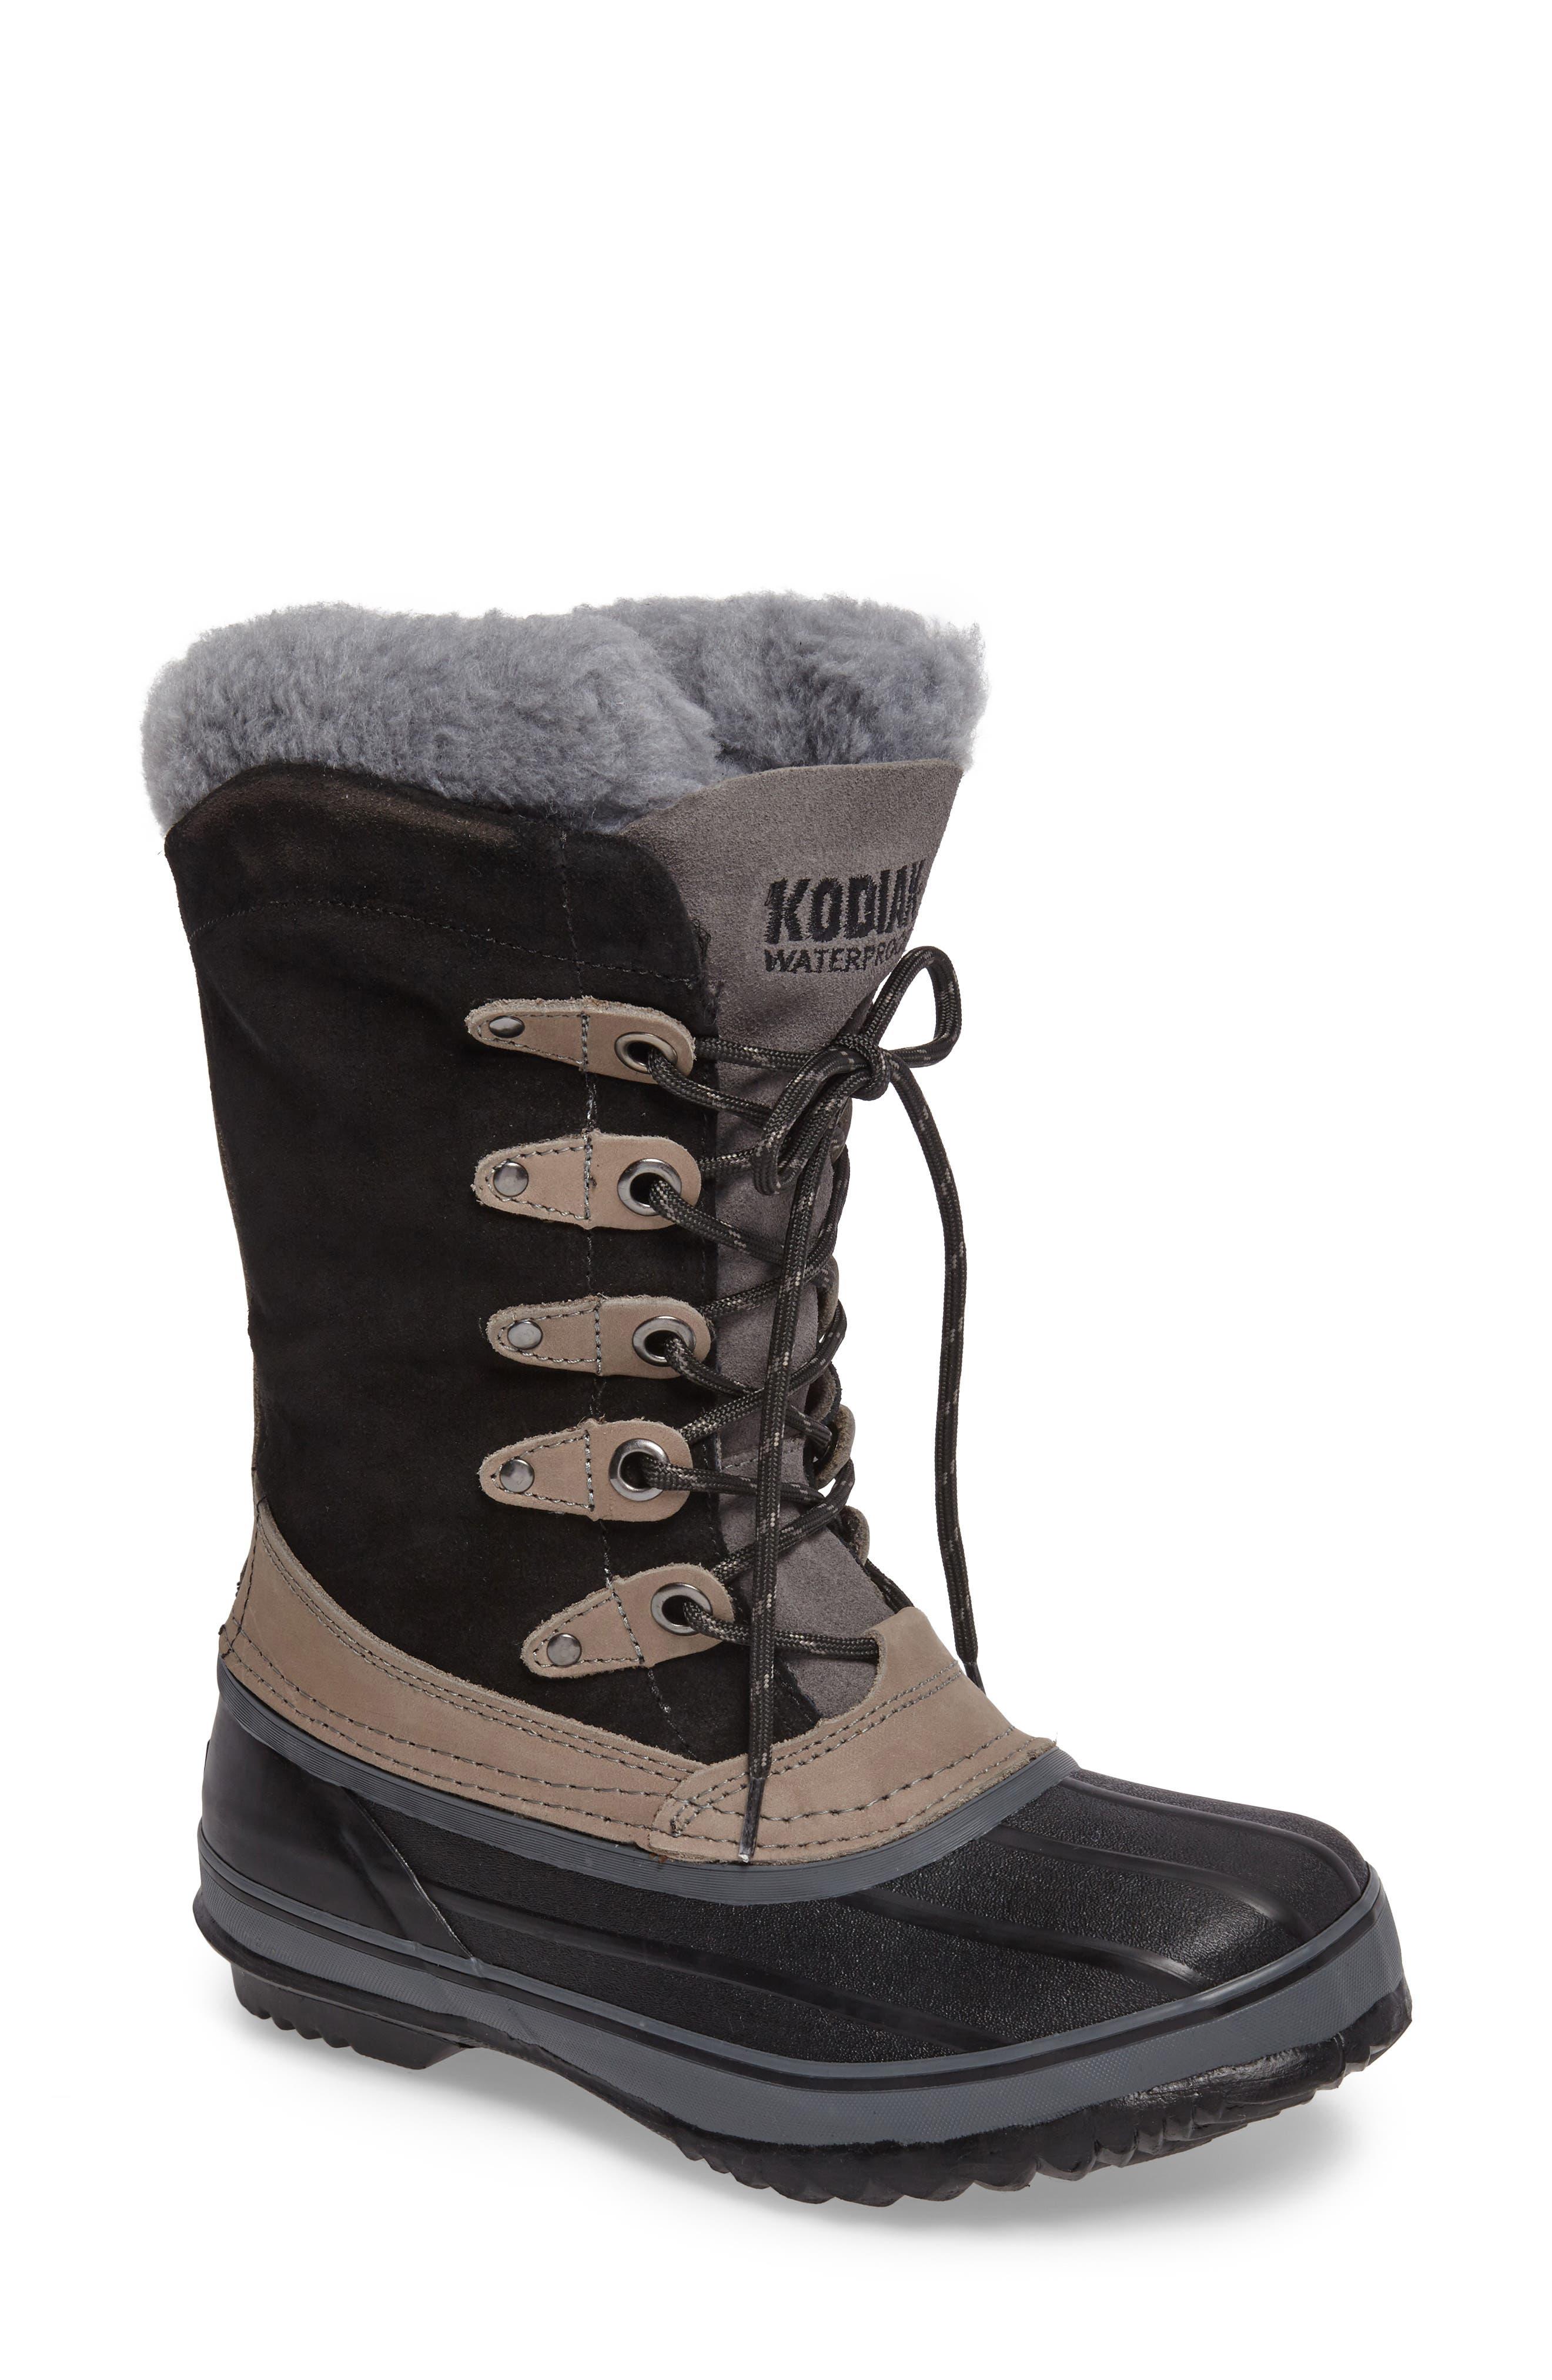 Kyra Waterproof Boot,                         Main,                         color, 001